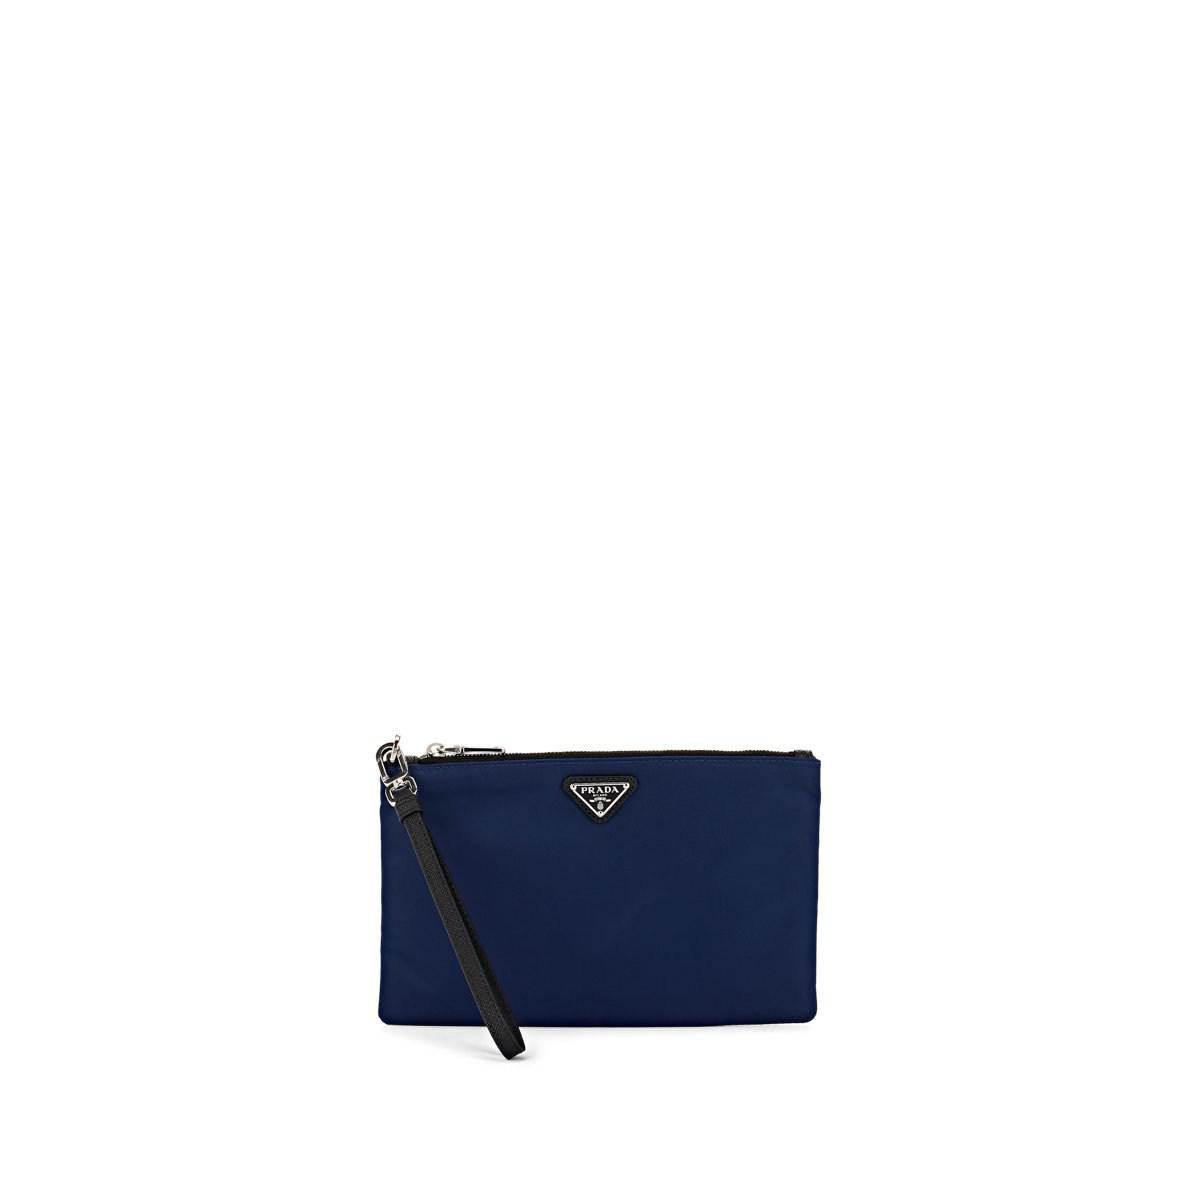 56830bfdf8b5 Lyst - Prada Logo Plaque Pouch in Blue for Men